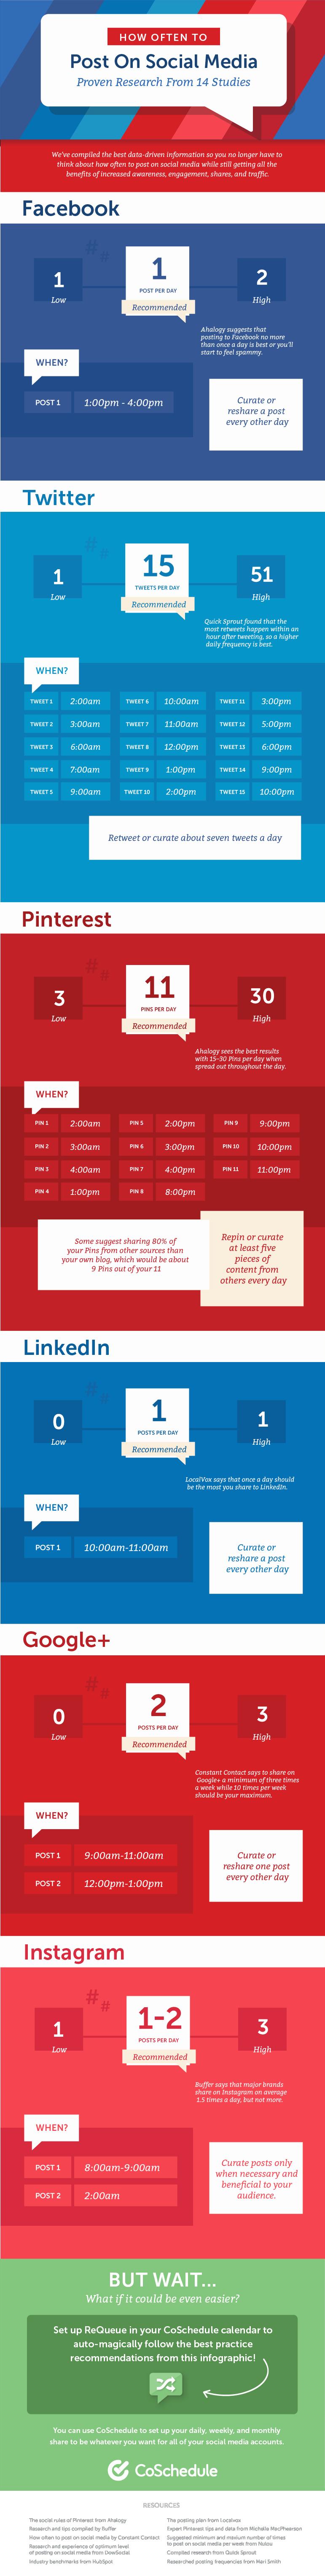 Social Media Post Scheduler Template Elegant social Media Editorial Calendar How to organize Yours